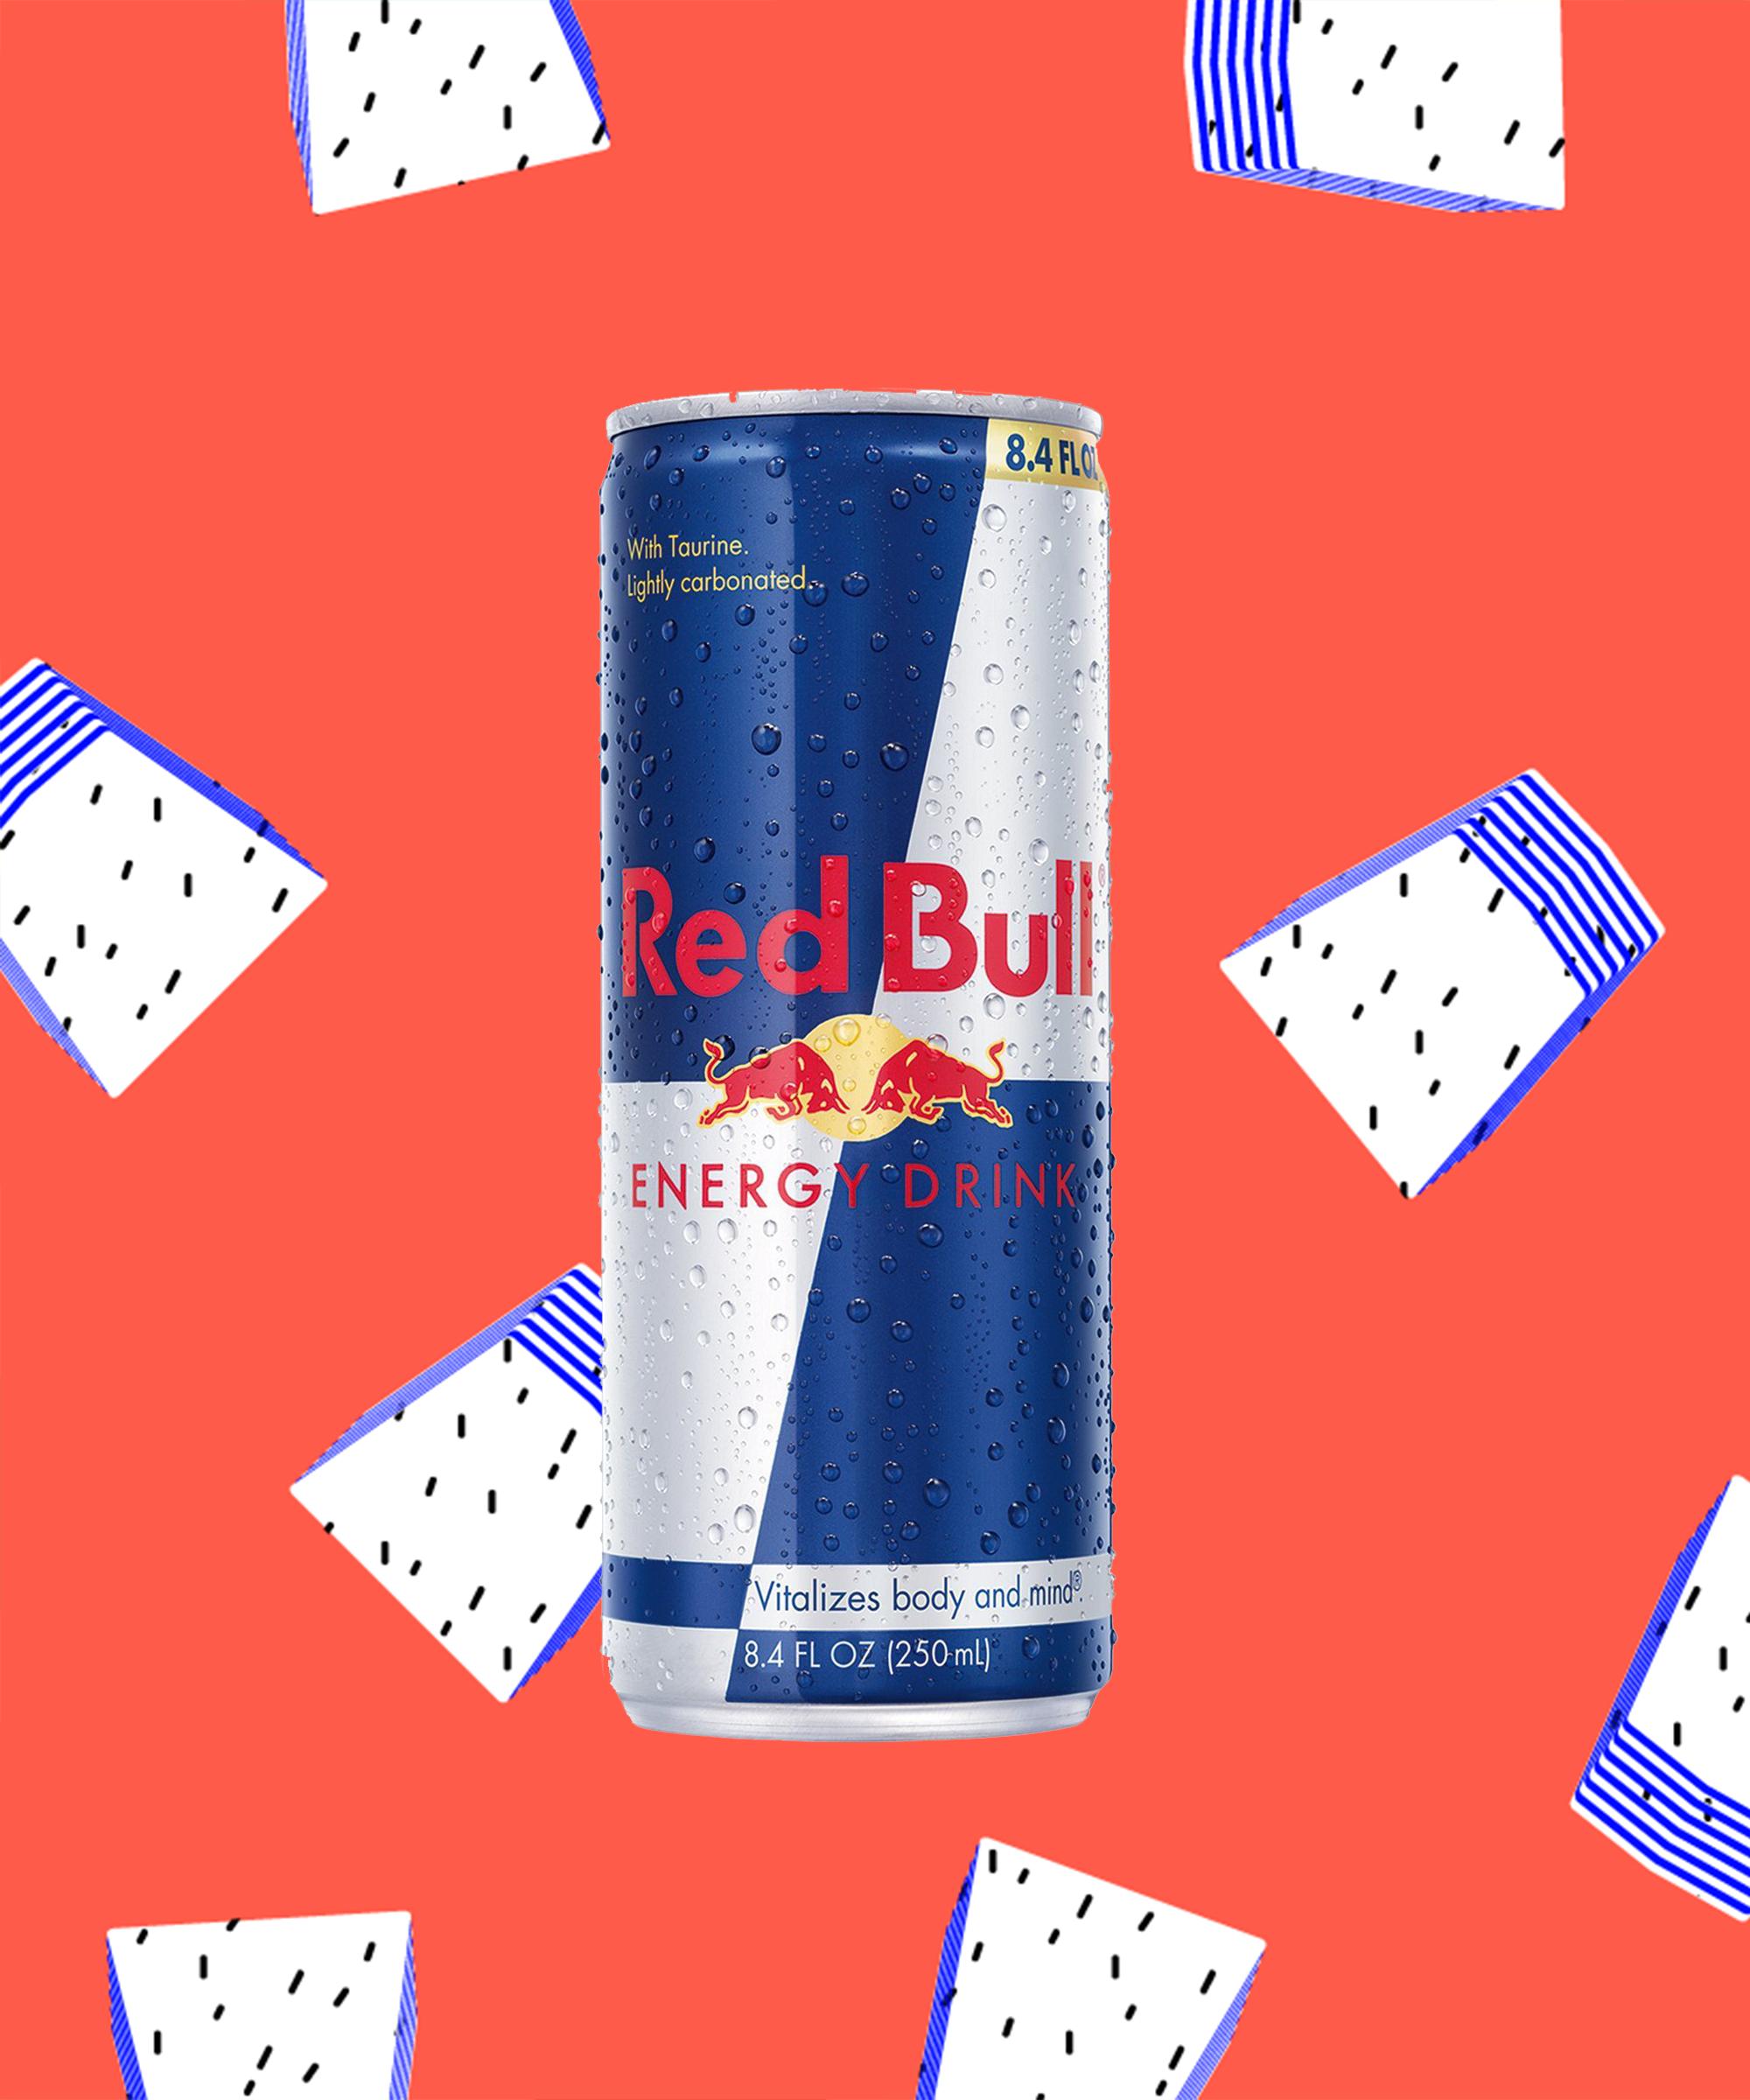 Red Bull Ingredients - Taurine Benefits Mental Health